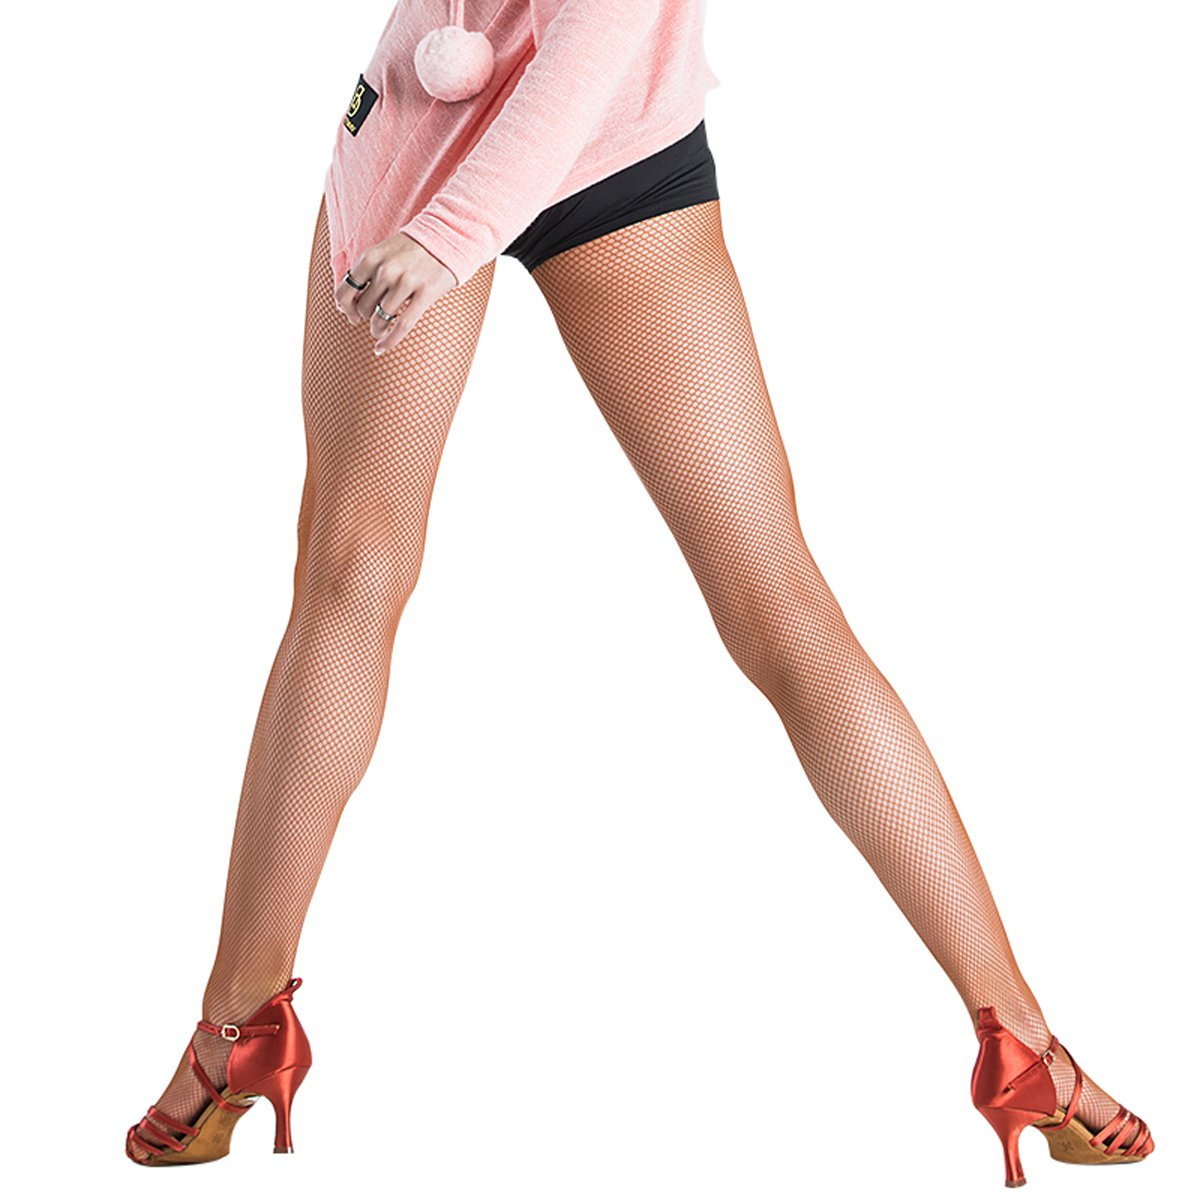 adfd89aef00 Amazon.com  Pitping Professional Latin Dance Pantyhose Stockings Socks  Fishnet Seamless Tights Dancing Race  Clothing